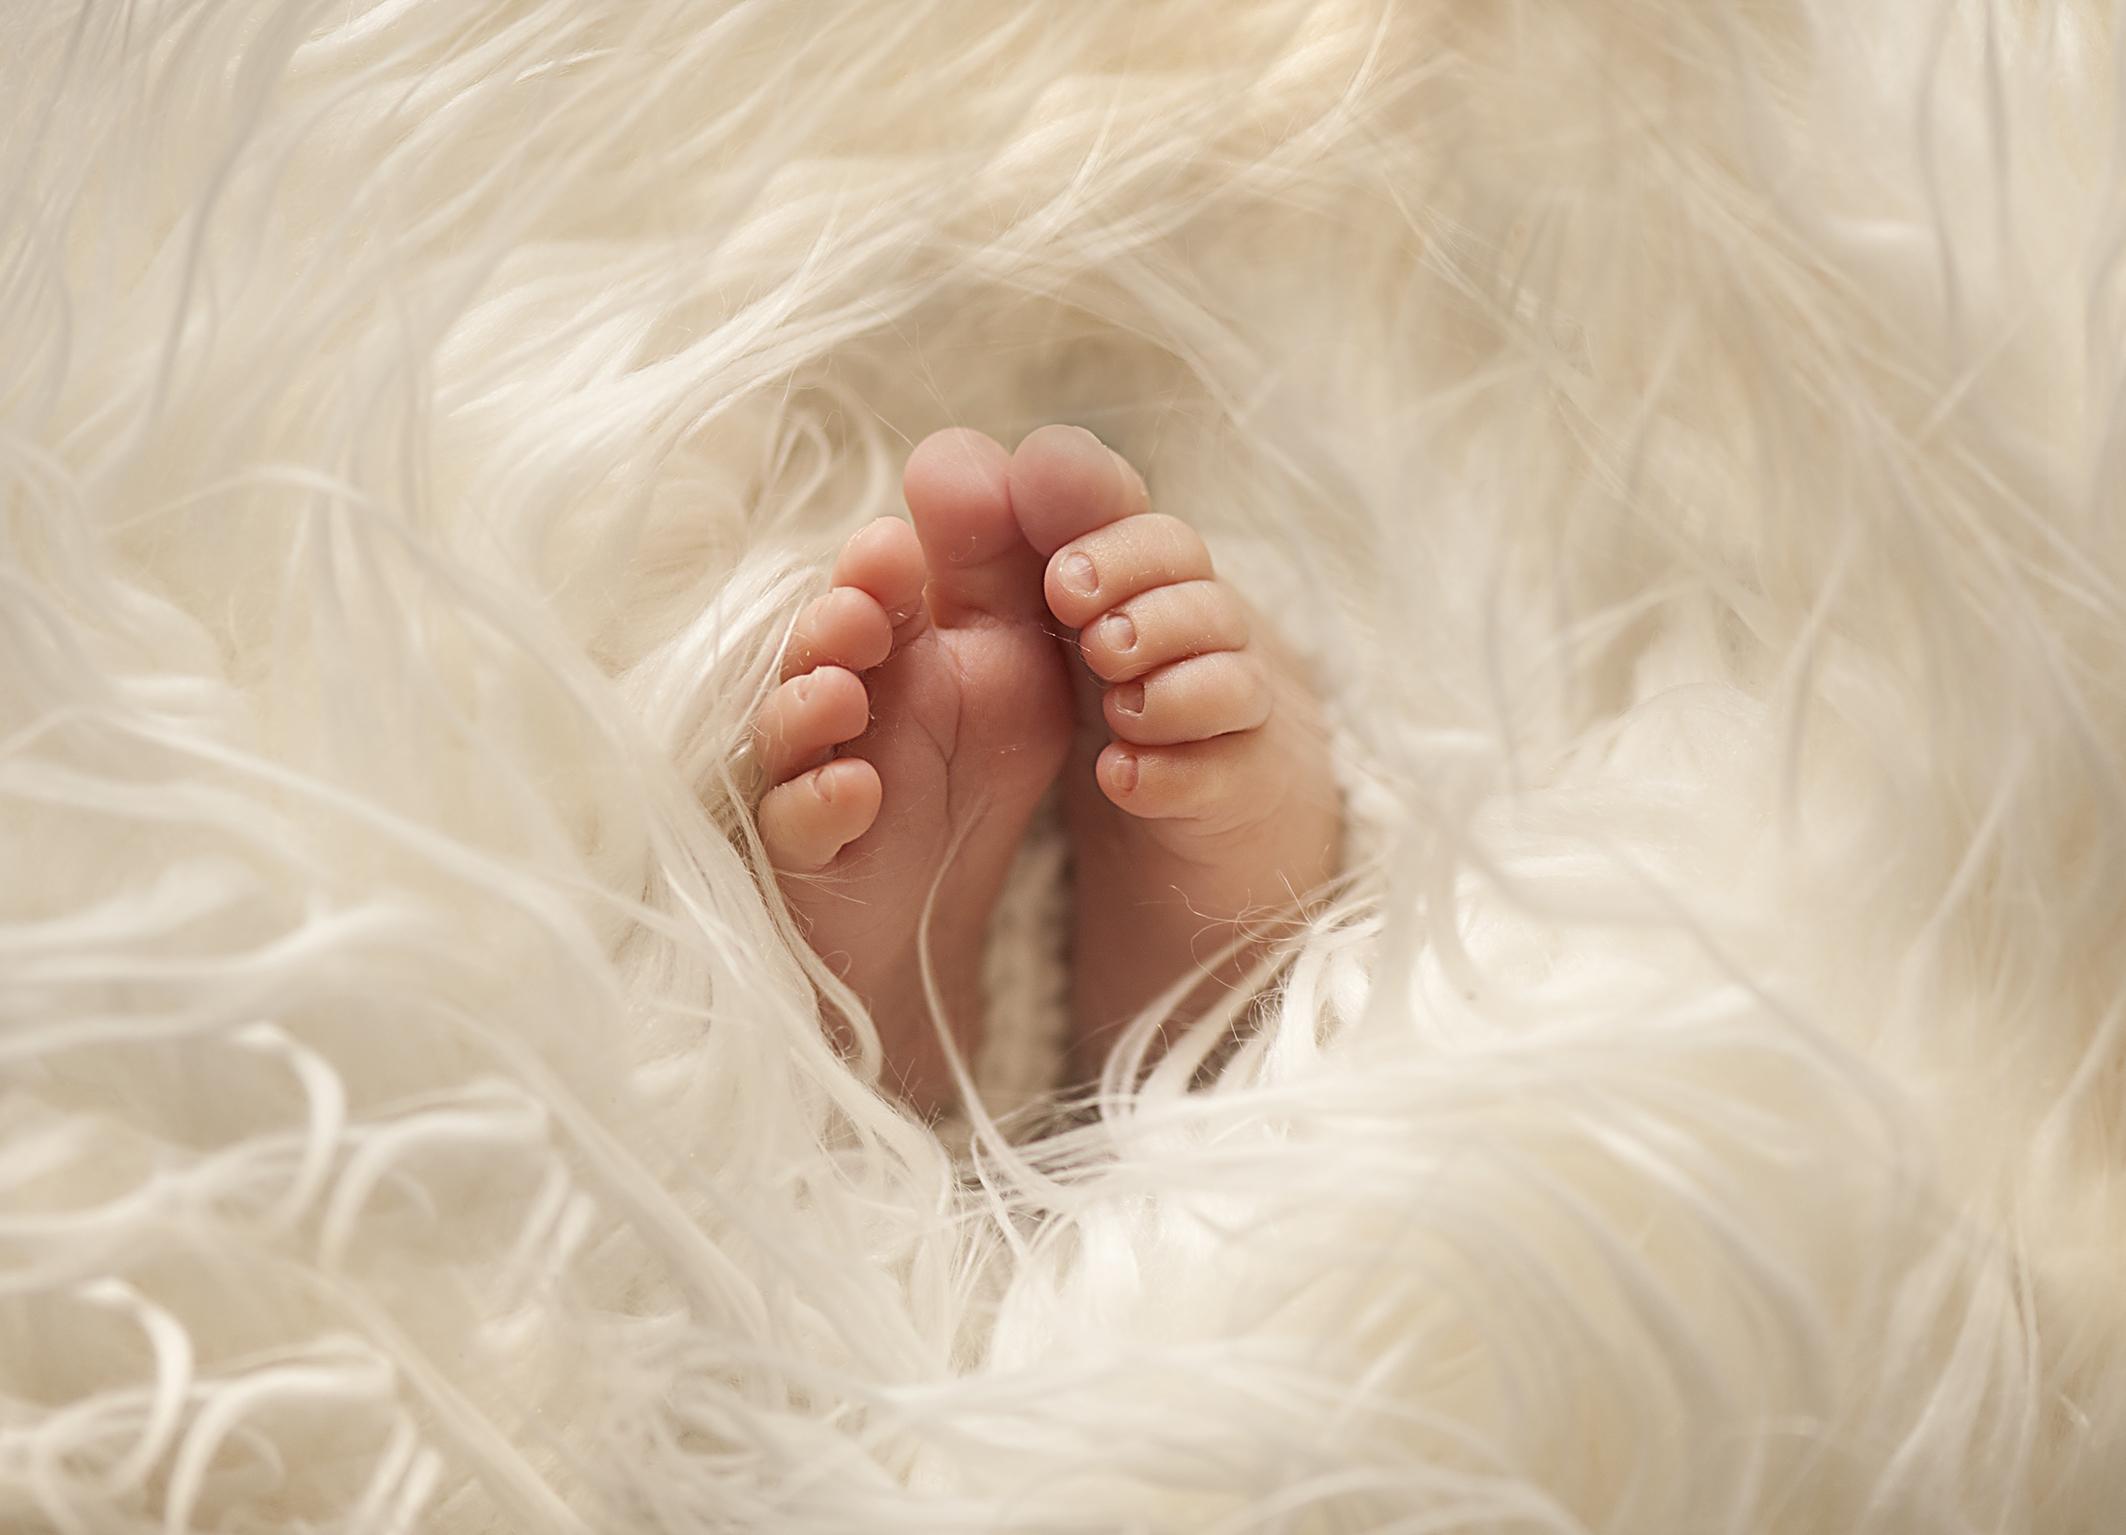 Contate Fotografia Infantil - Claudia Milani